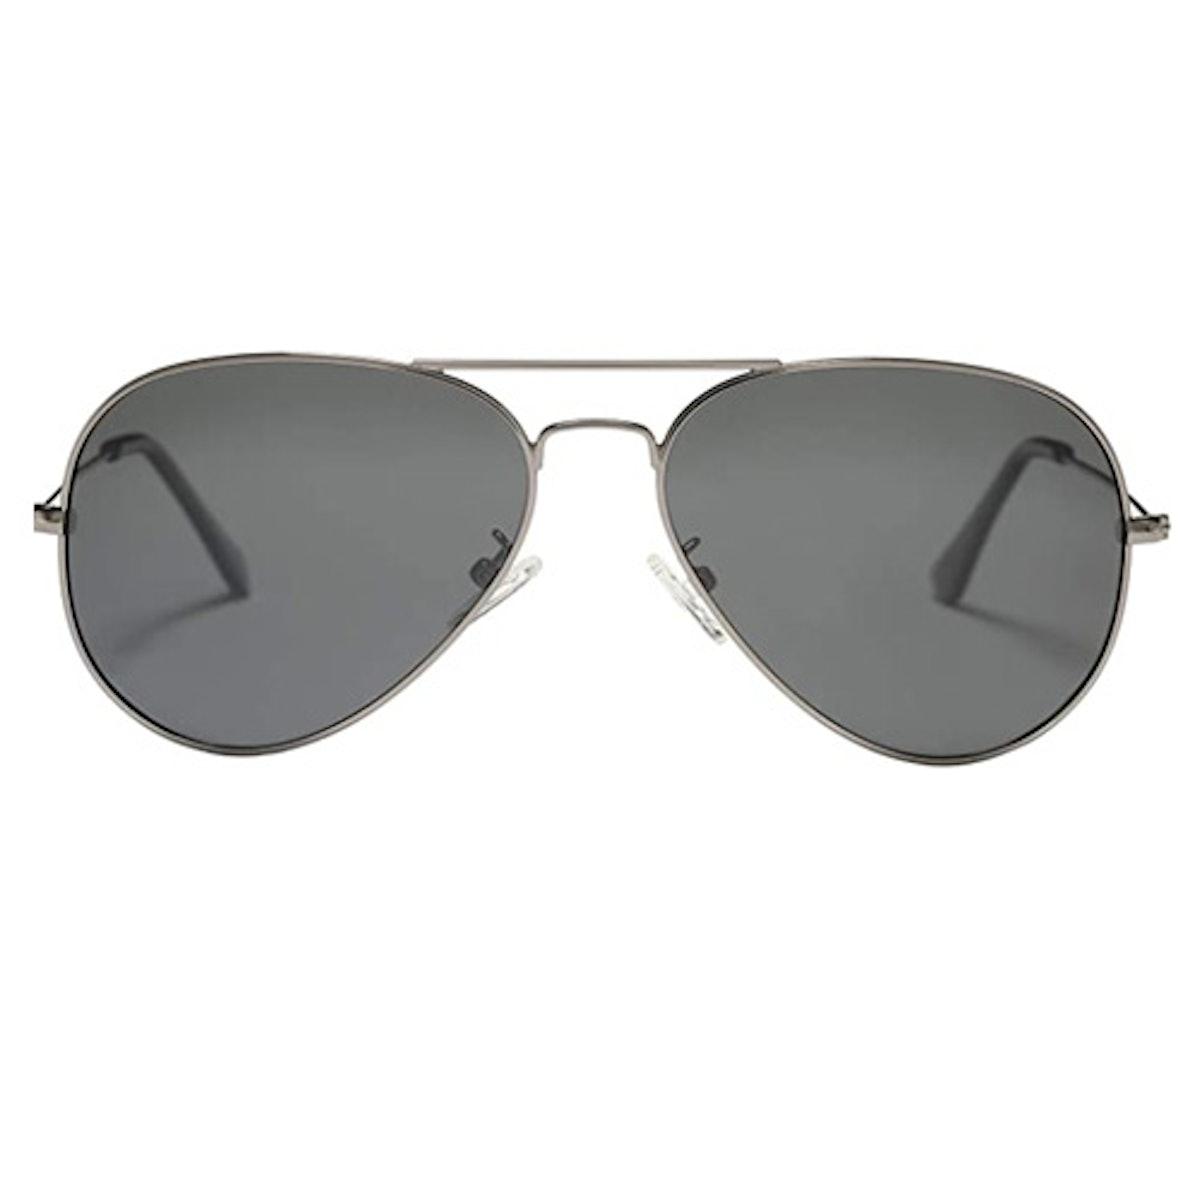 Pro Acme Polarized Aviator Sunglasses